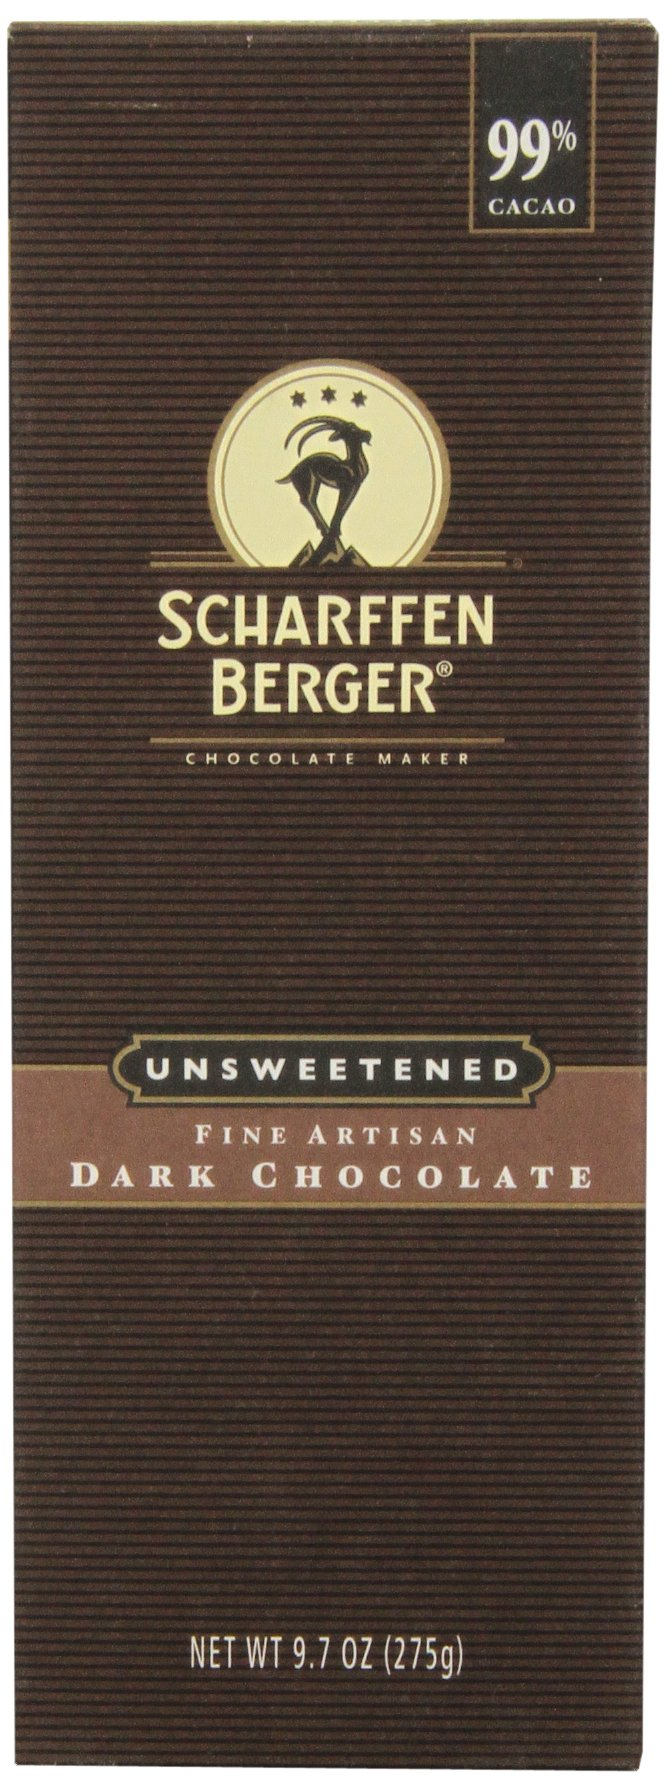 SCHARFFEN BERGER Dark Chocolate, 9.7oz, Unsweetened Chocolate